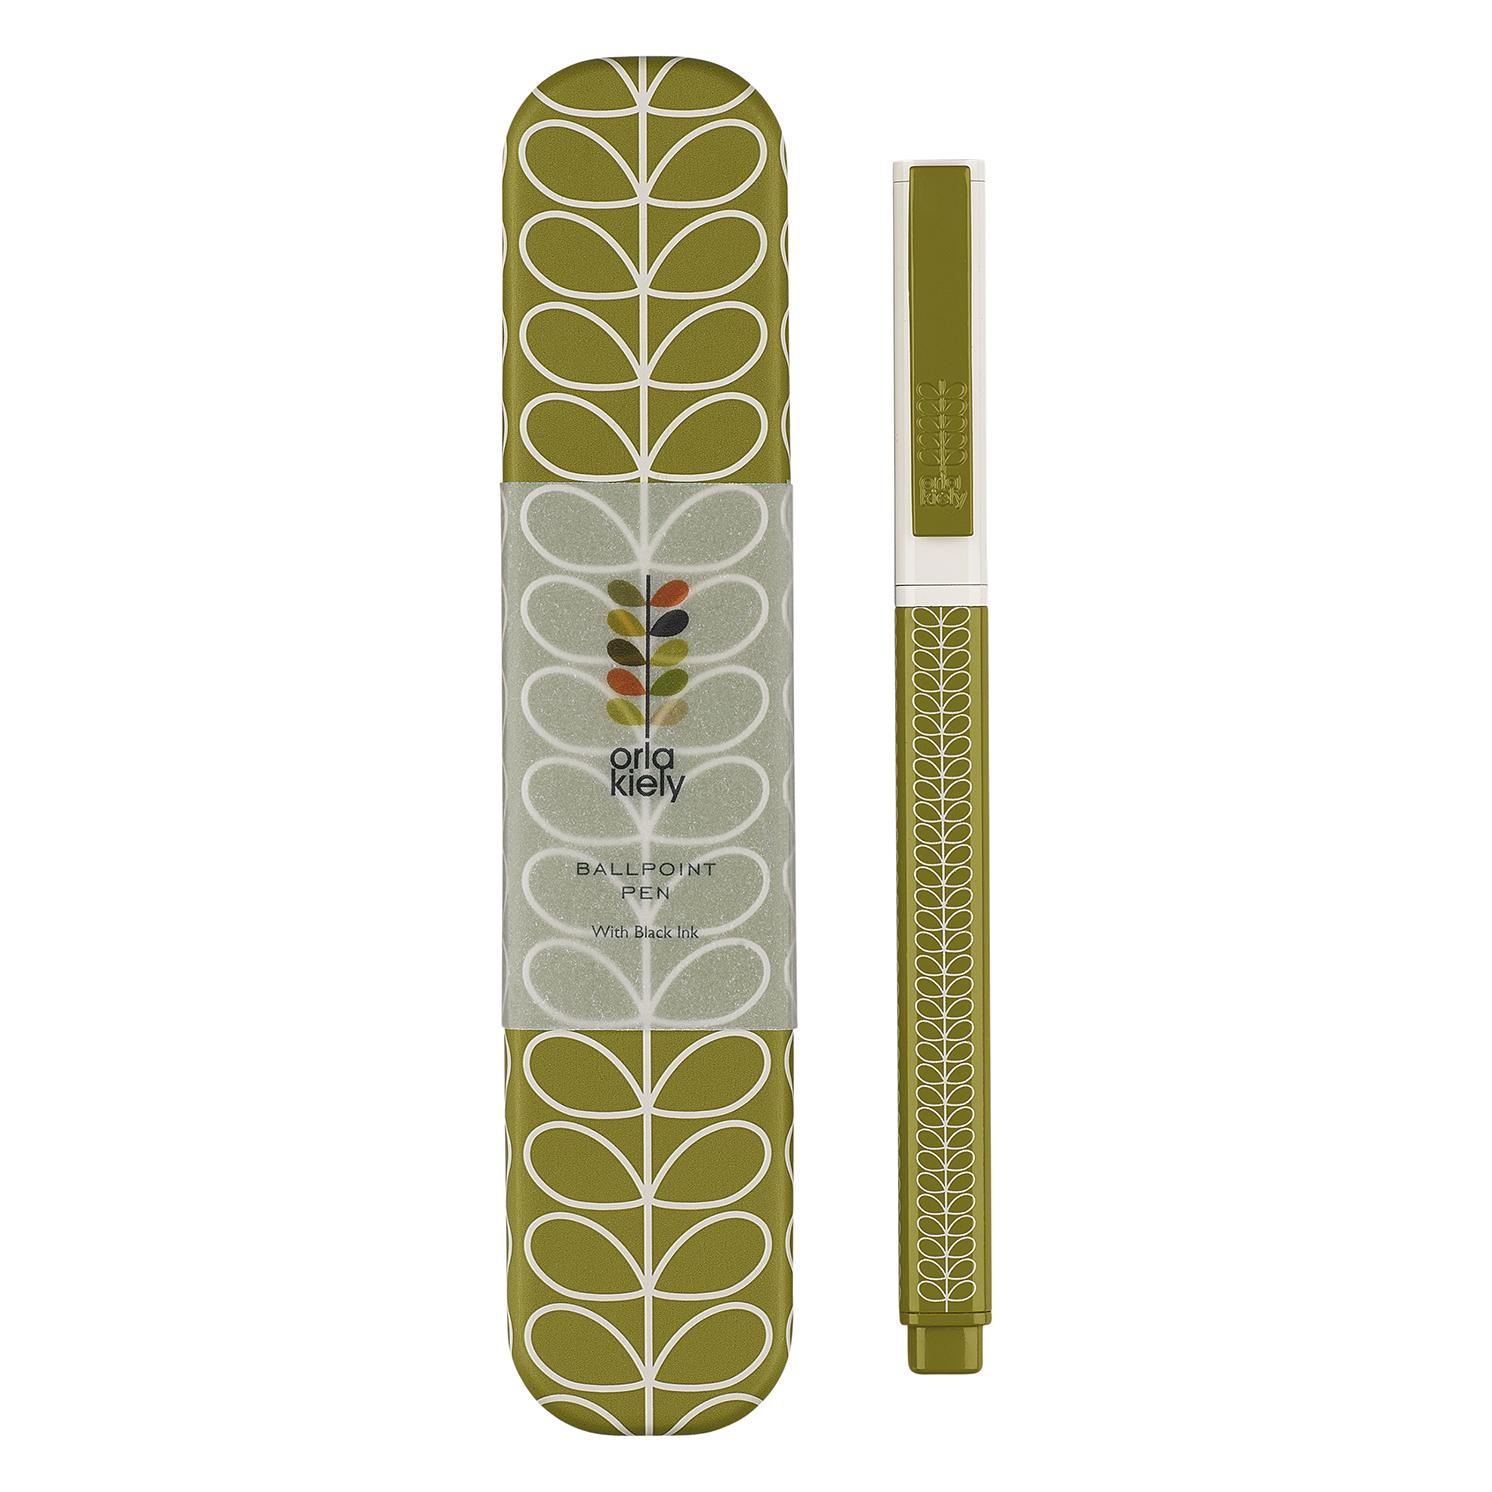 Orla Kiely – Seagrass Linear Stem Ballpoint Pen in Metal Presentation Gift Tin